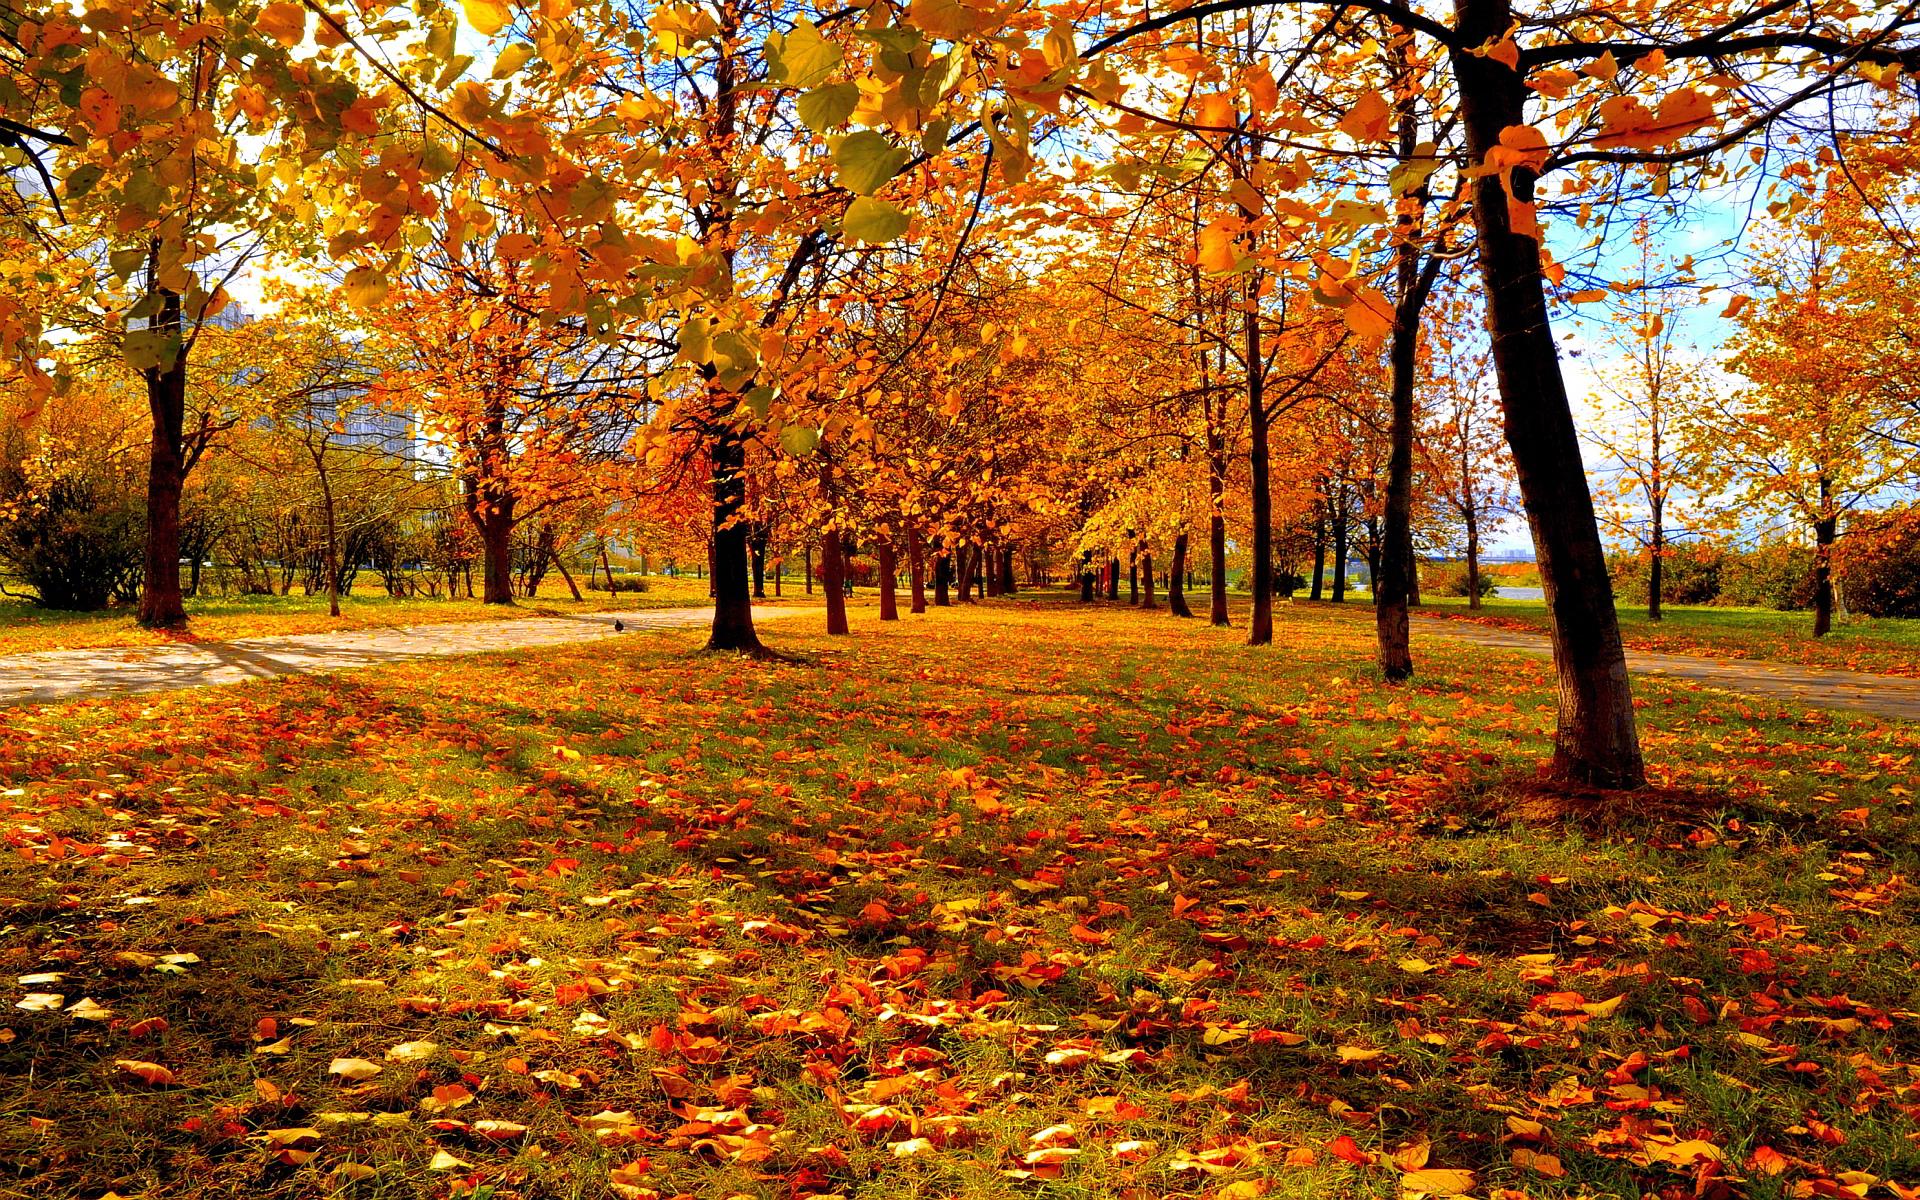 Autumn park leaves sunset